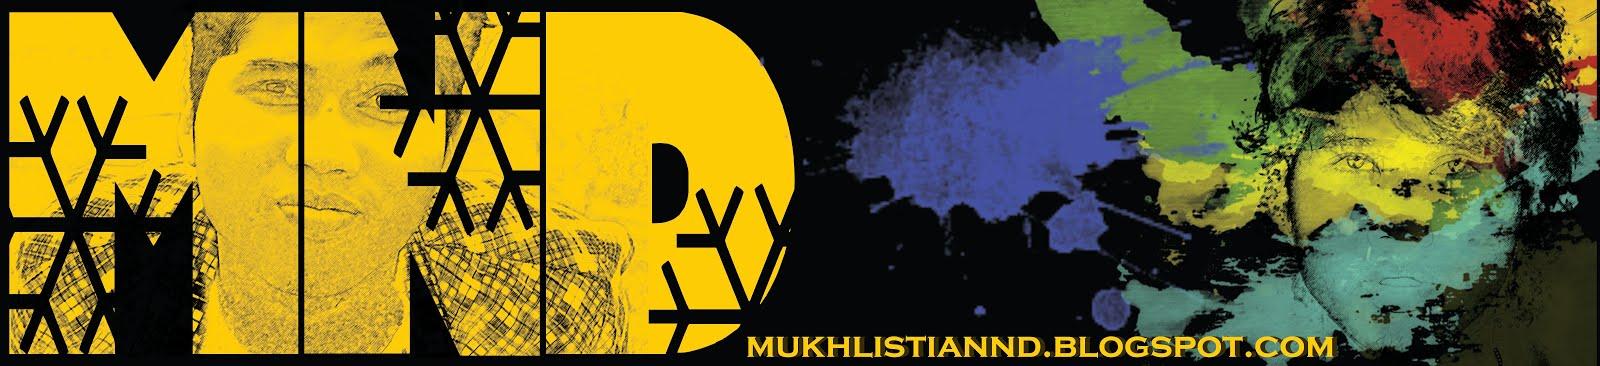 mukhlistiannd.blogspot.com